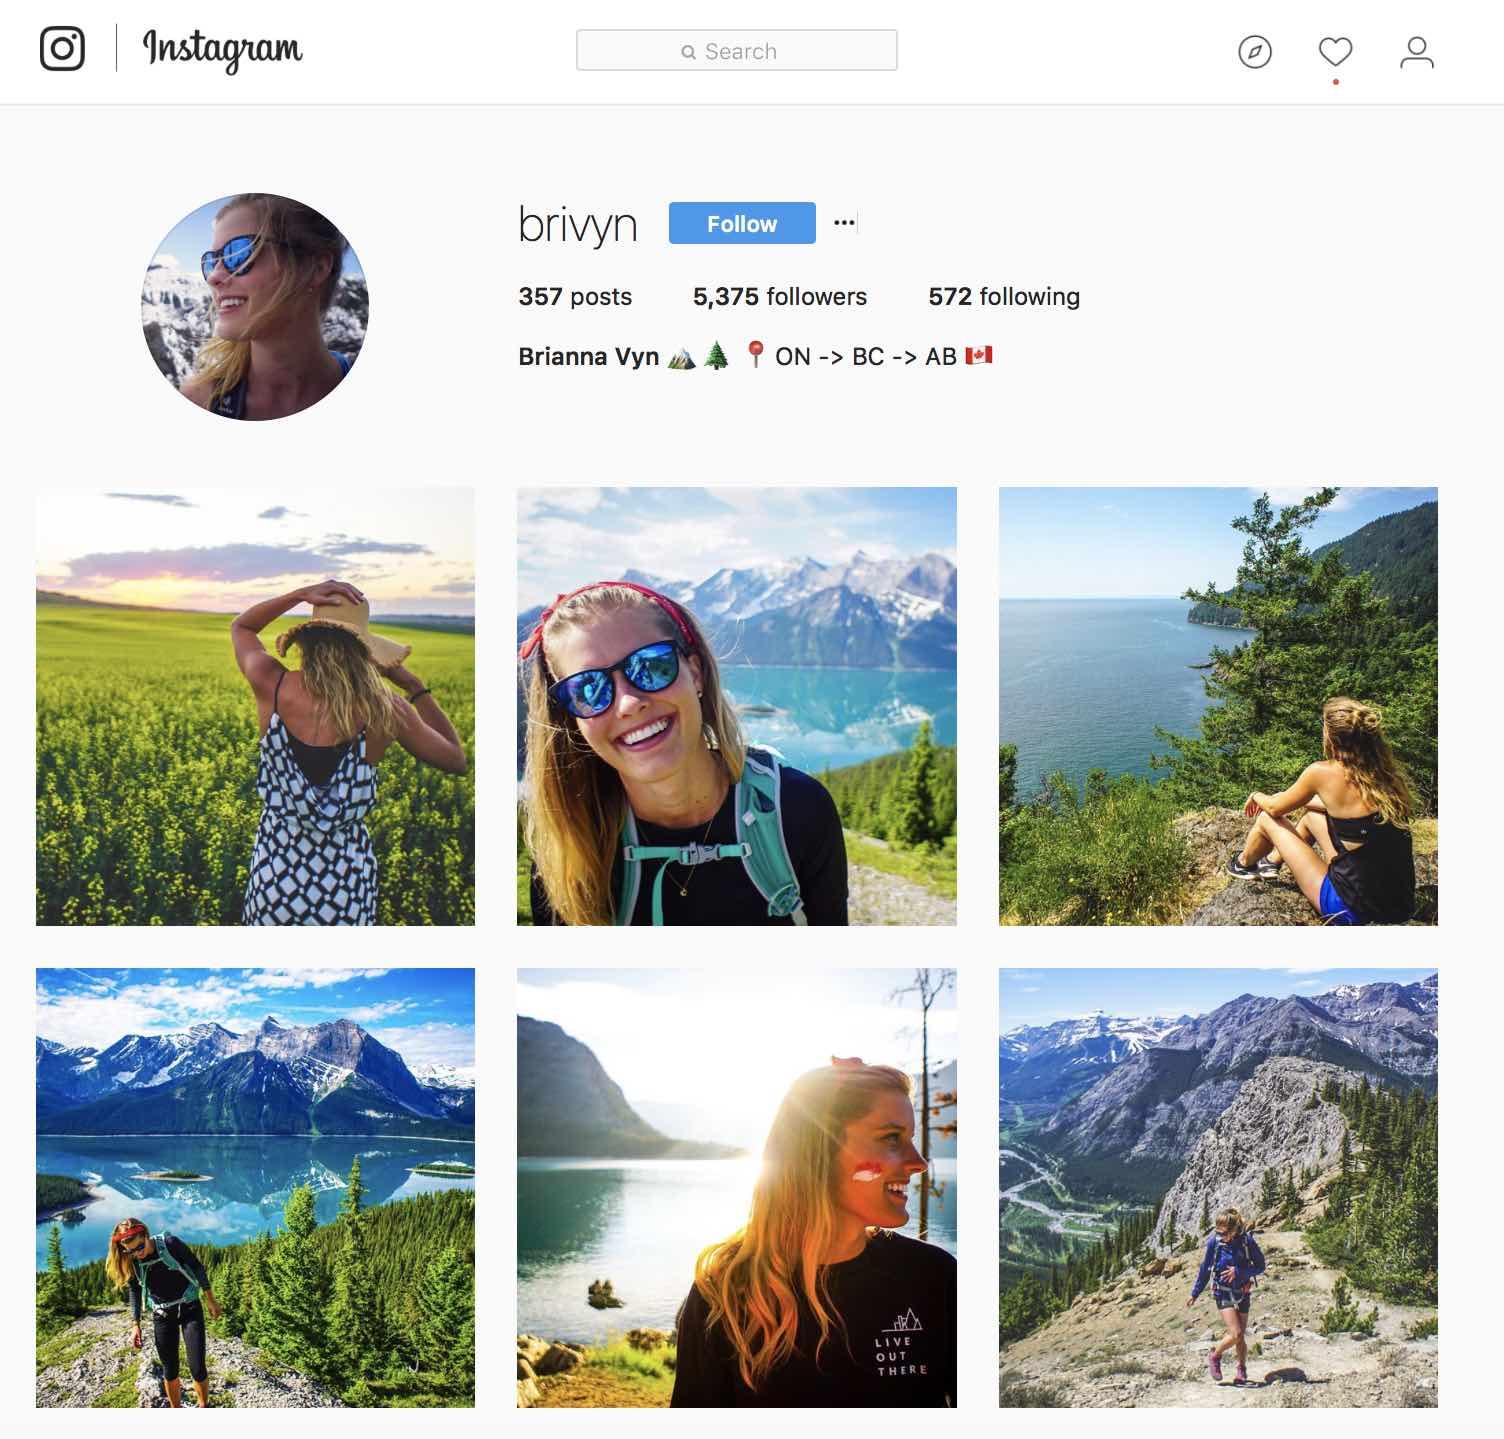 brivyn-instagram-profile